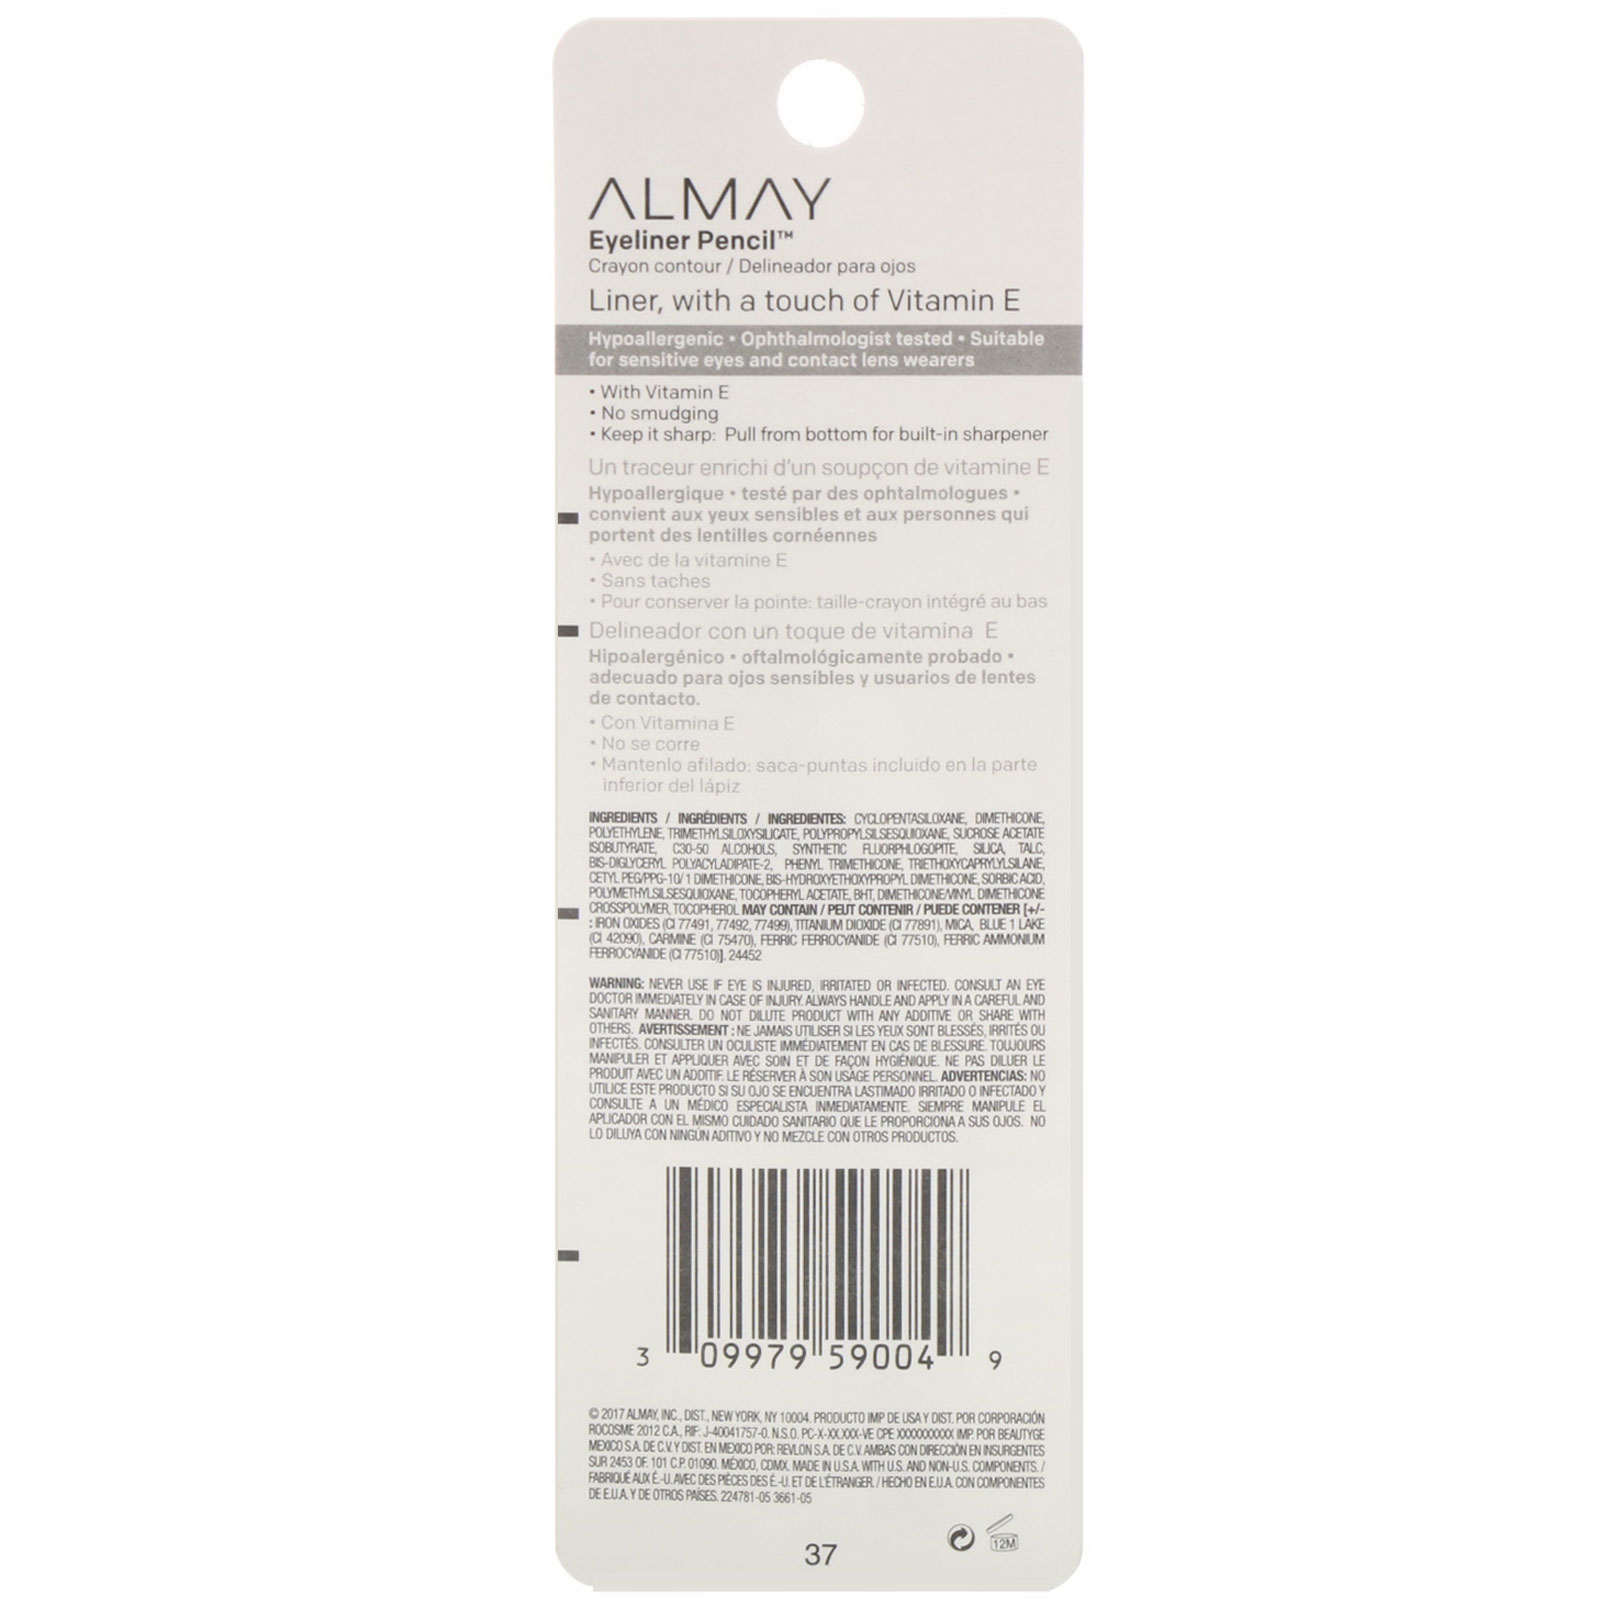 Almay, Top of the Line, Eyeliner Pencil, 209 Black Raisin, 0 009 oz (0 27 g)